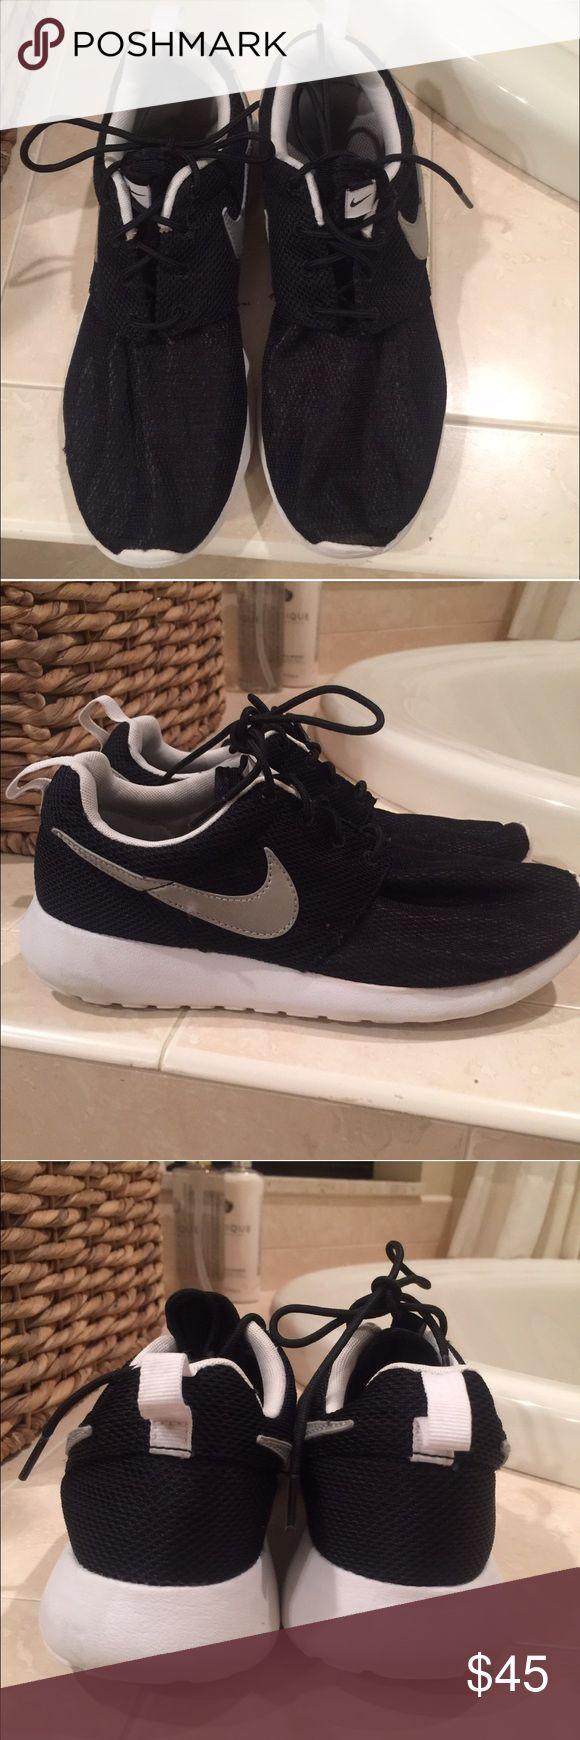 Nike Roche size 6 1/2 black boys running shoes Nike Roche size 6 1/2 black boys running shoes. In good used condition. Nike Shoes Sneakers